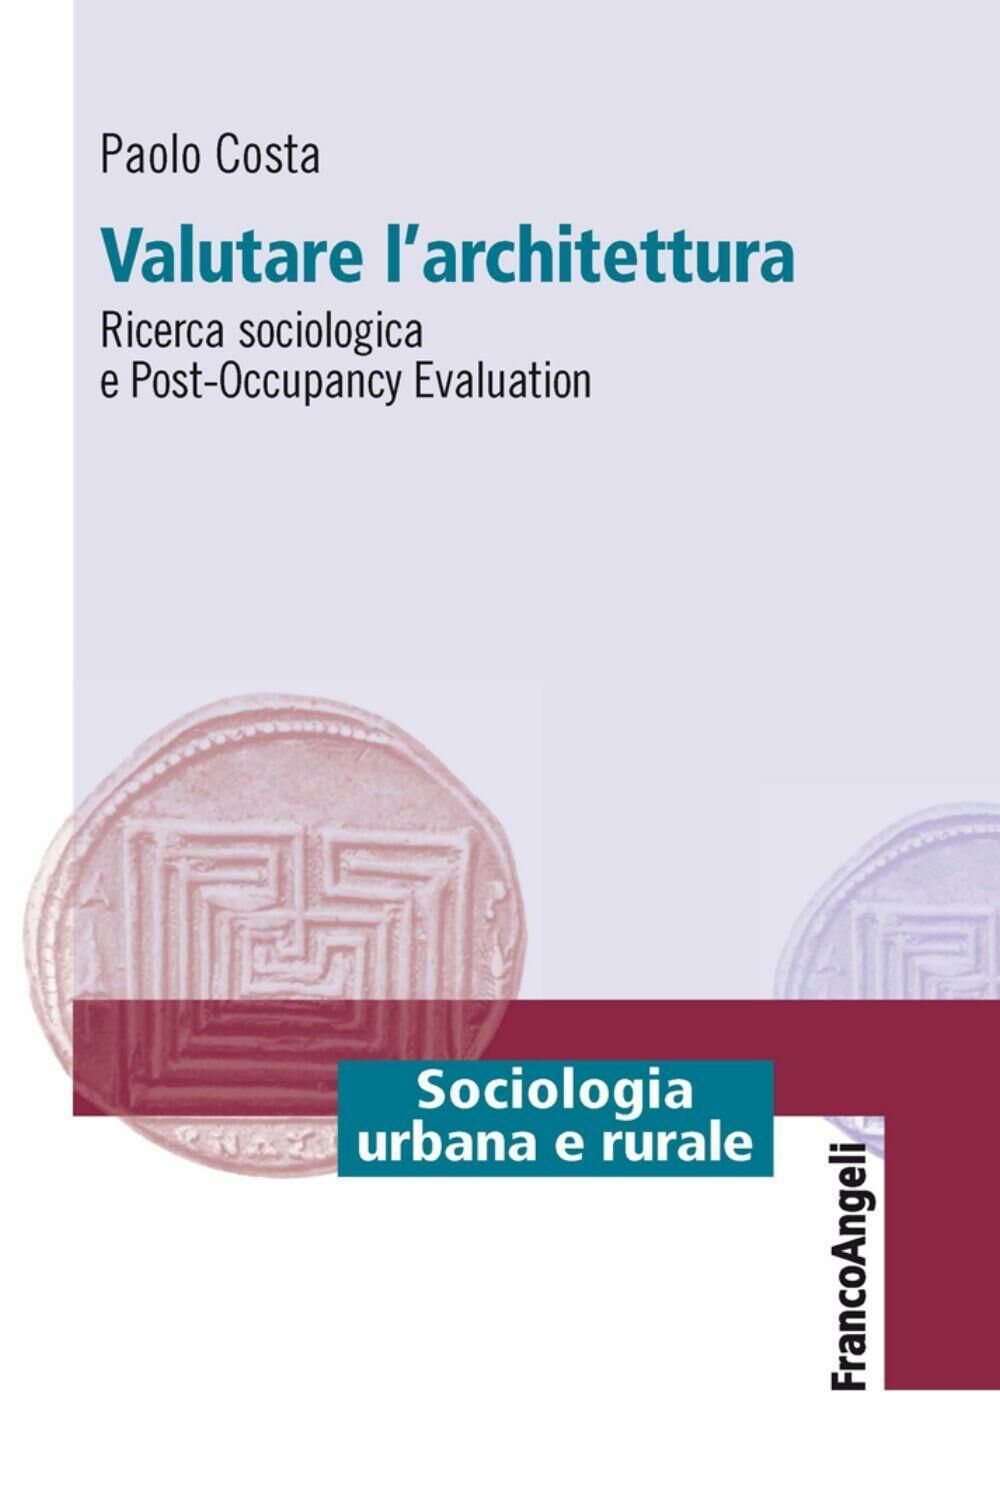 Valutare l'architettura. Ricerca sociologica e post-occupancy evaluation